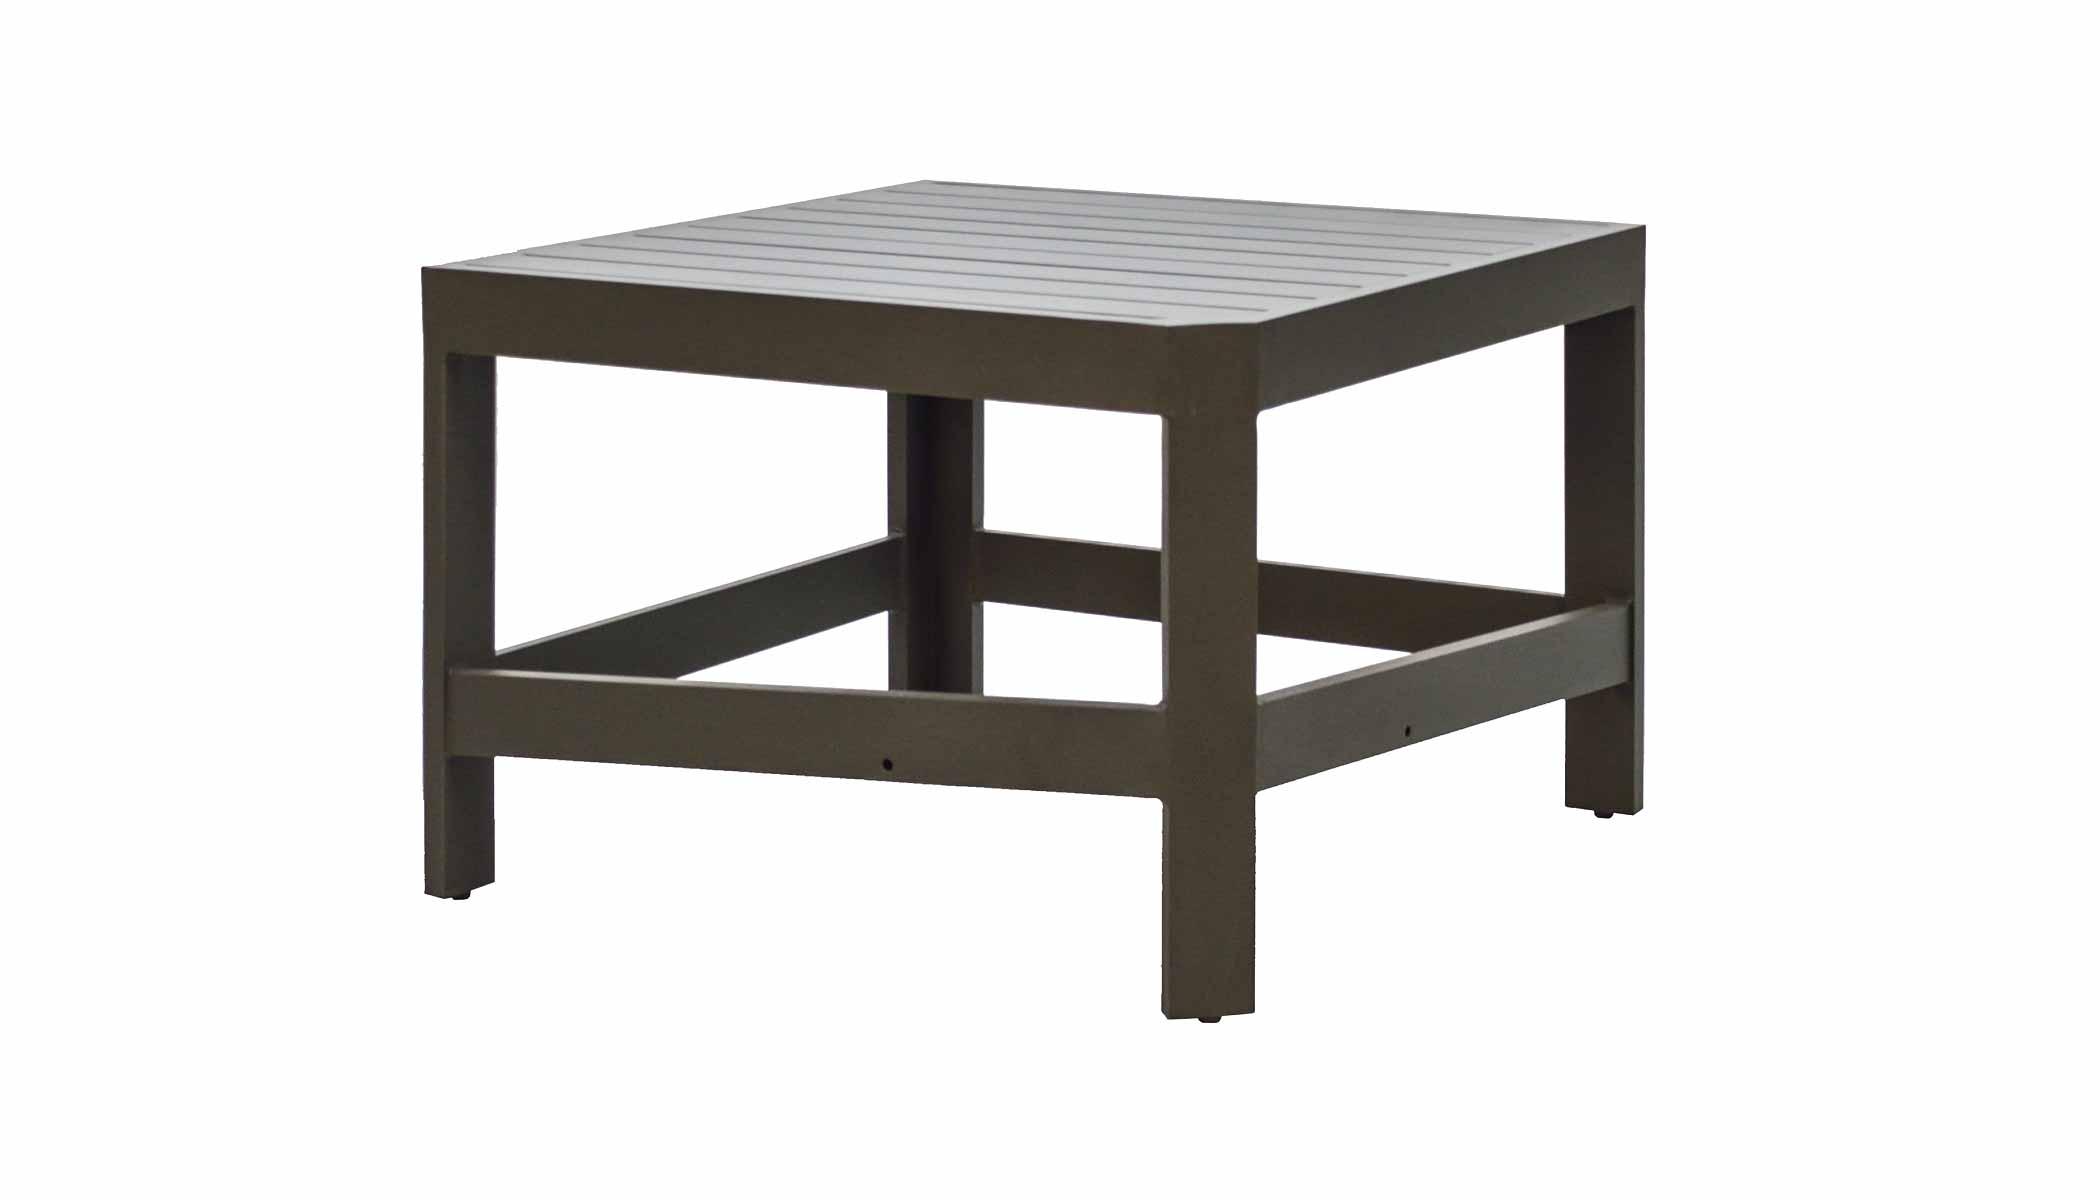 "976525 Covina Seactional Corner Table   33.2"" x 33.2"" x 23.4"""